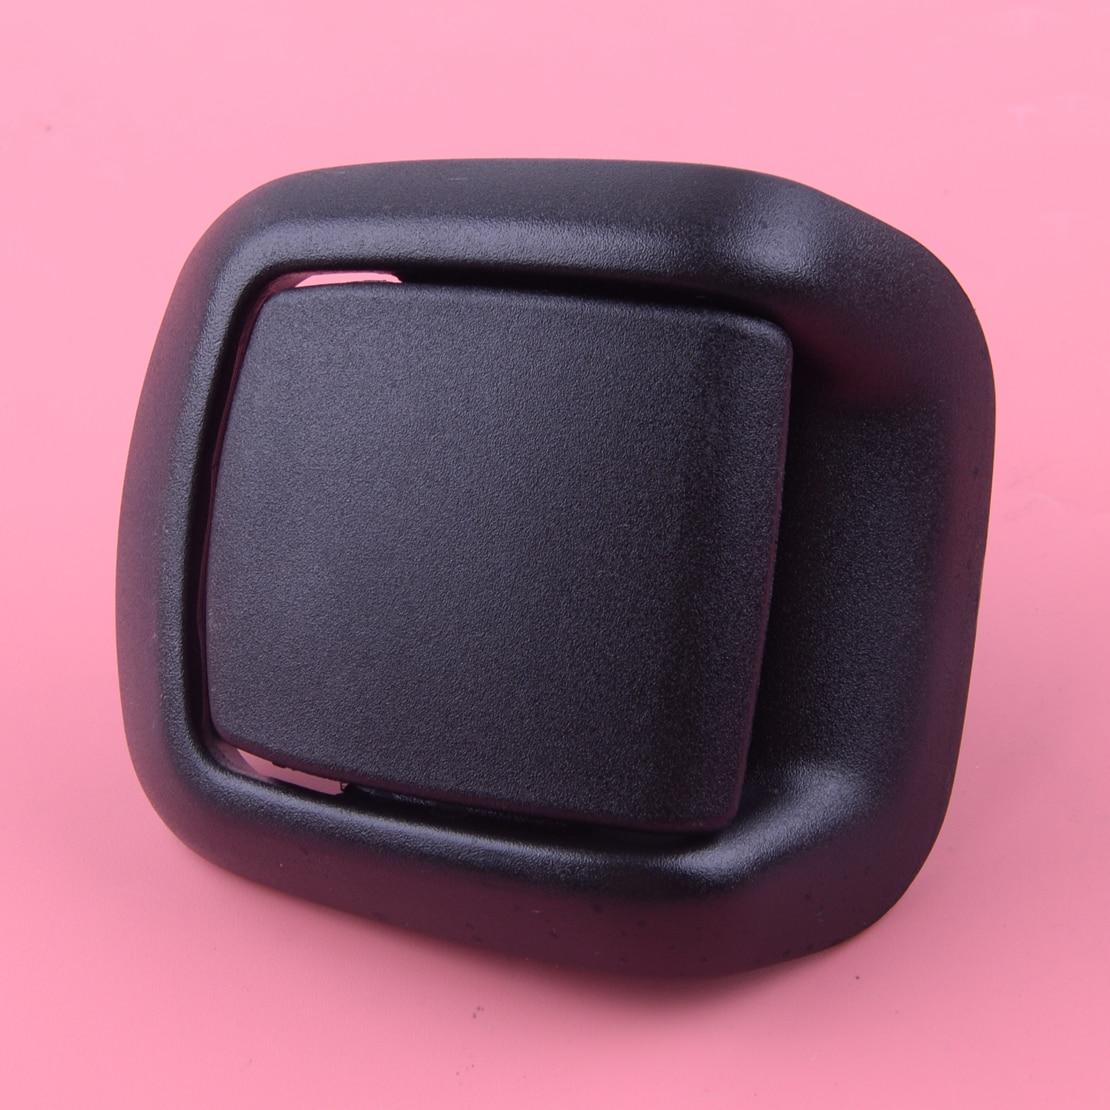 1417521 Car Inner Front Left Seat Tilt Handle Black Plastic Fit For Ford Fiesta MK6 VI 3 Door 2002 2003 2004 2005 2006 2007 2008